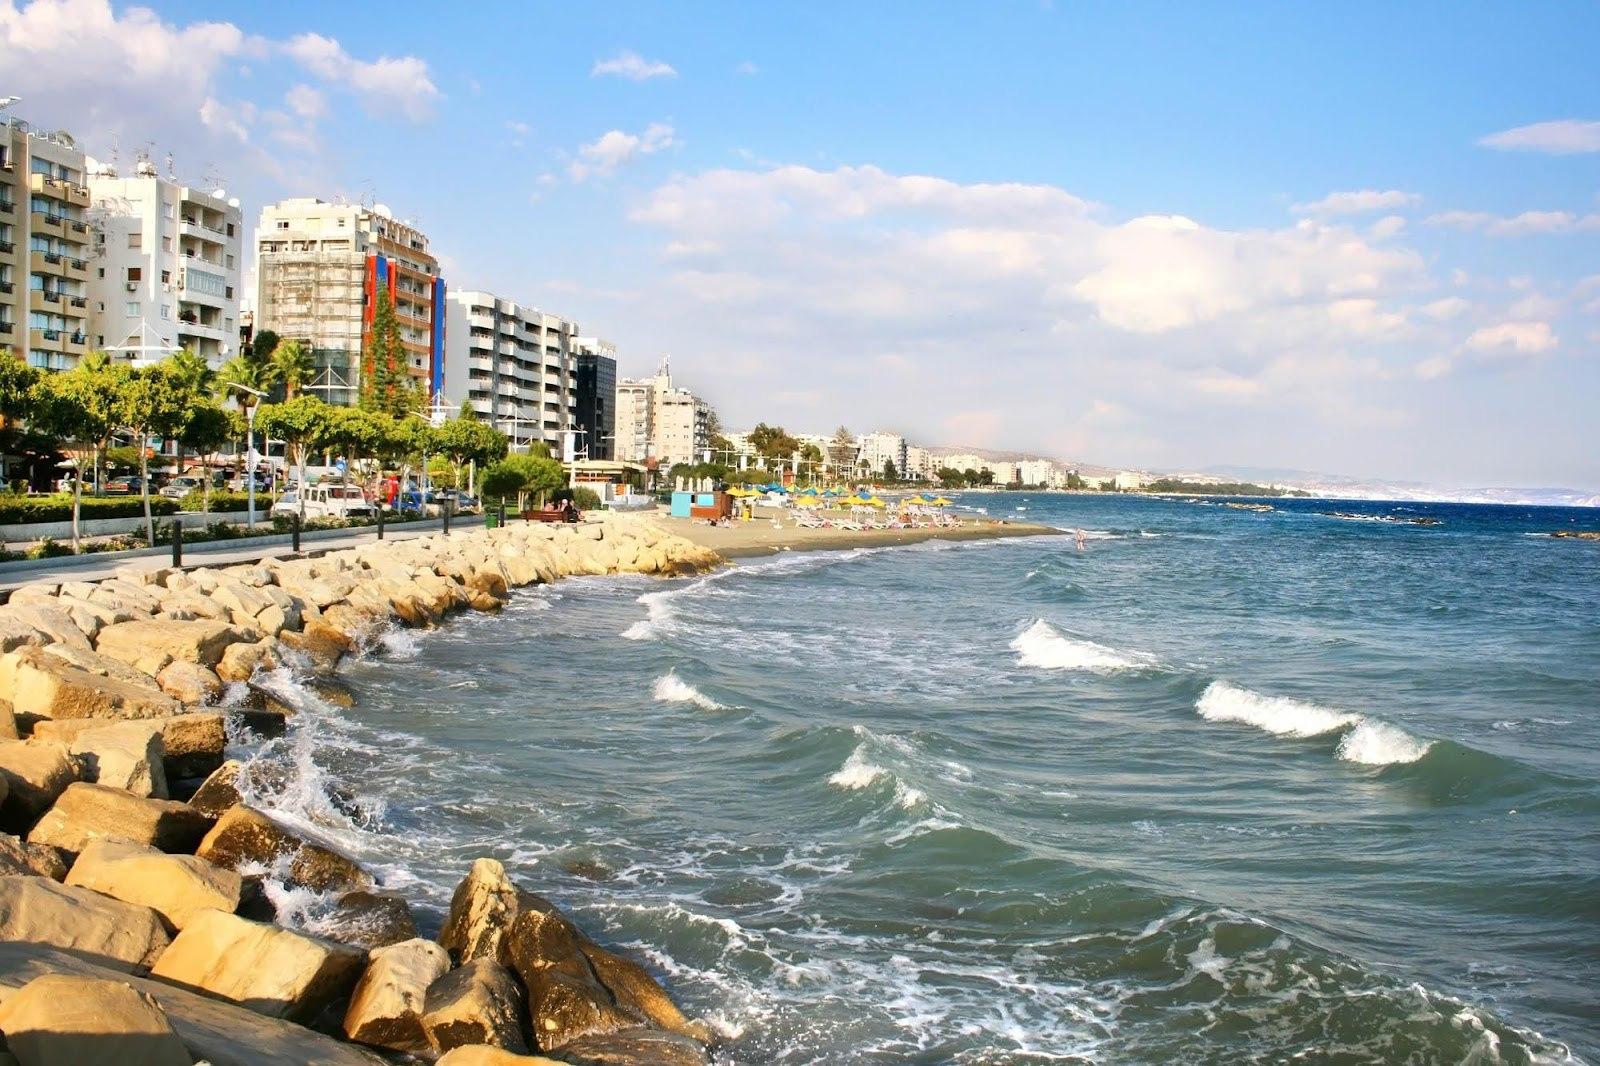 Кипр, Лимассол на 9 дней, завтрак+ужин за 24104 руб. с человека!